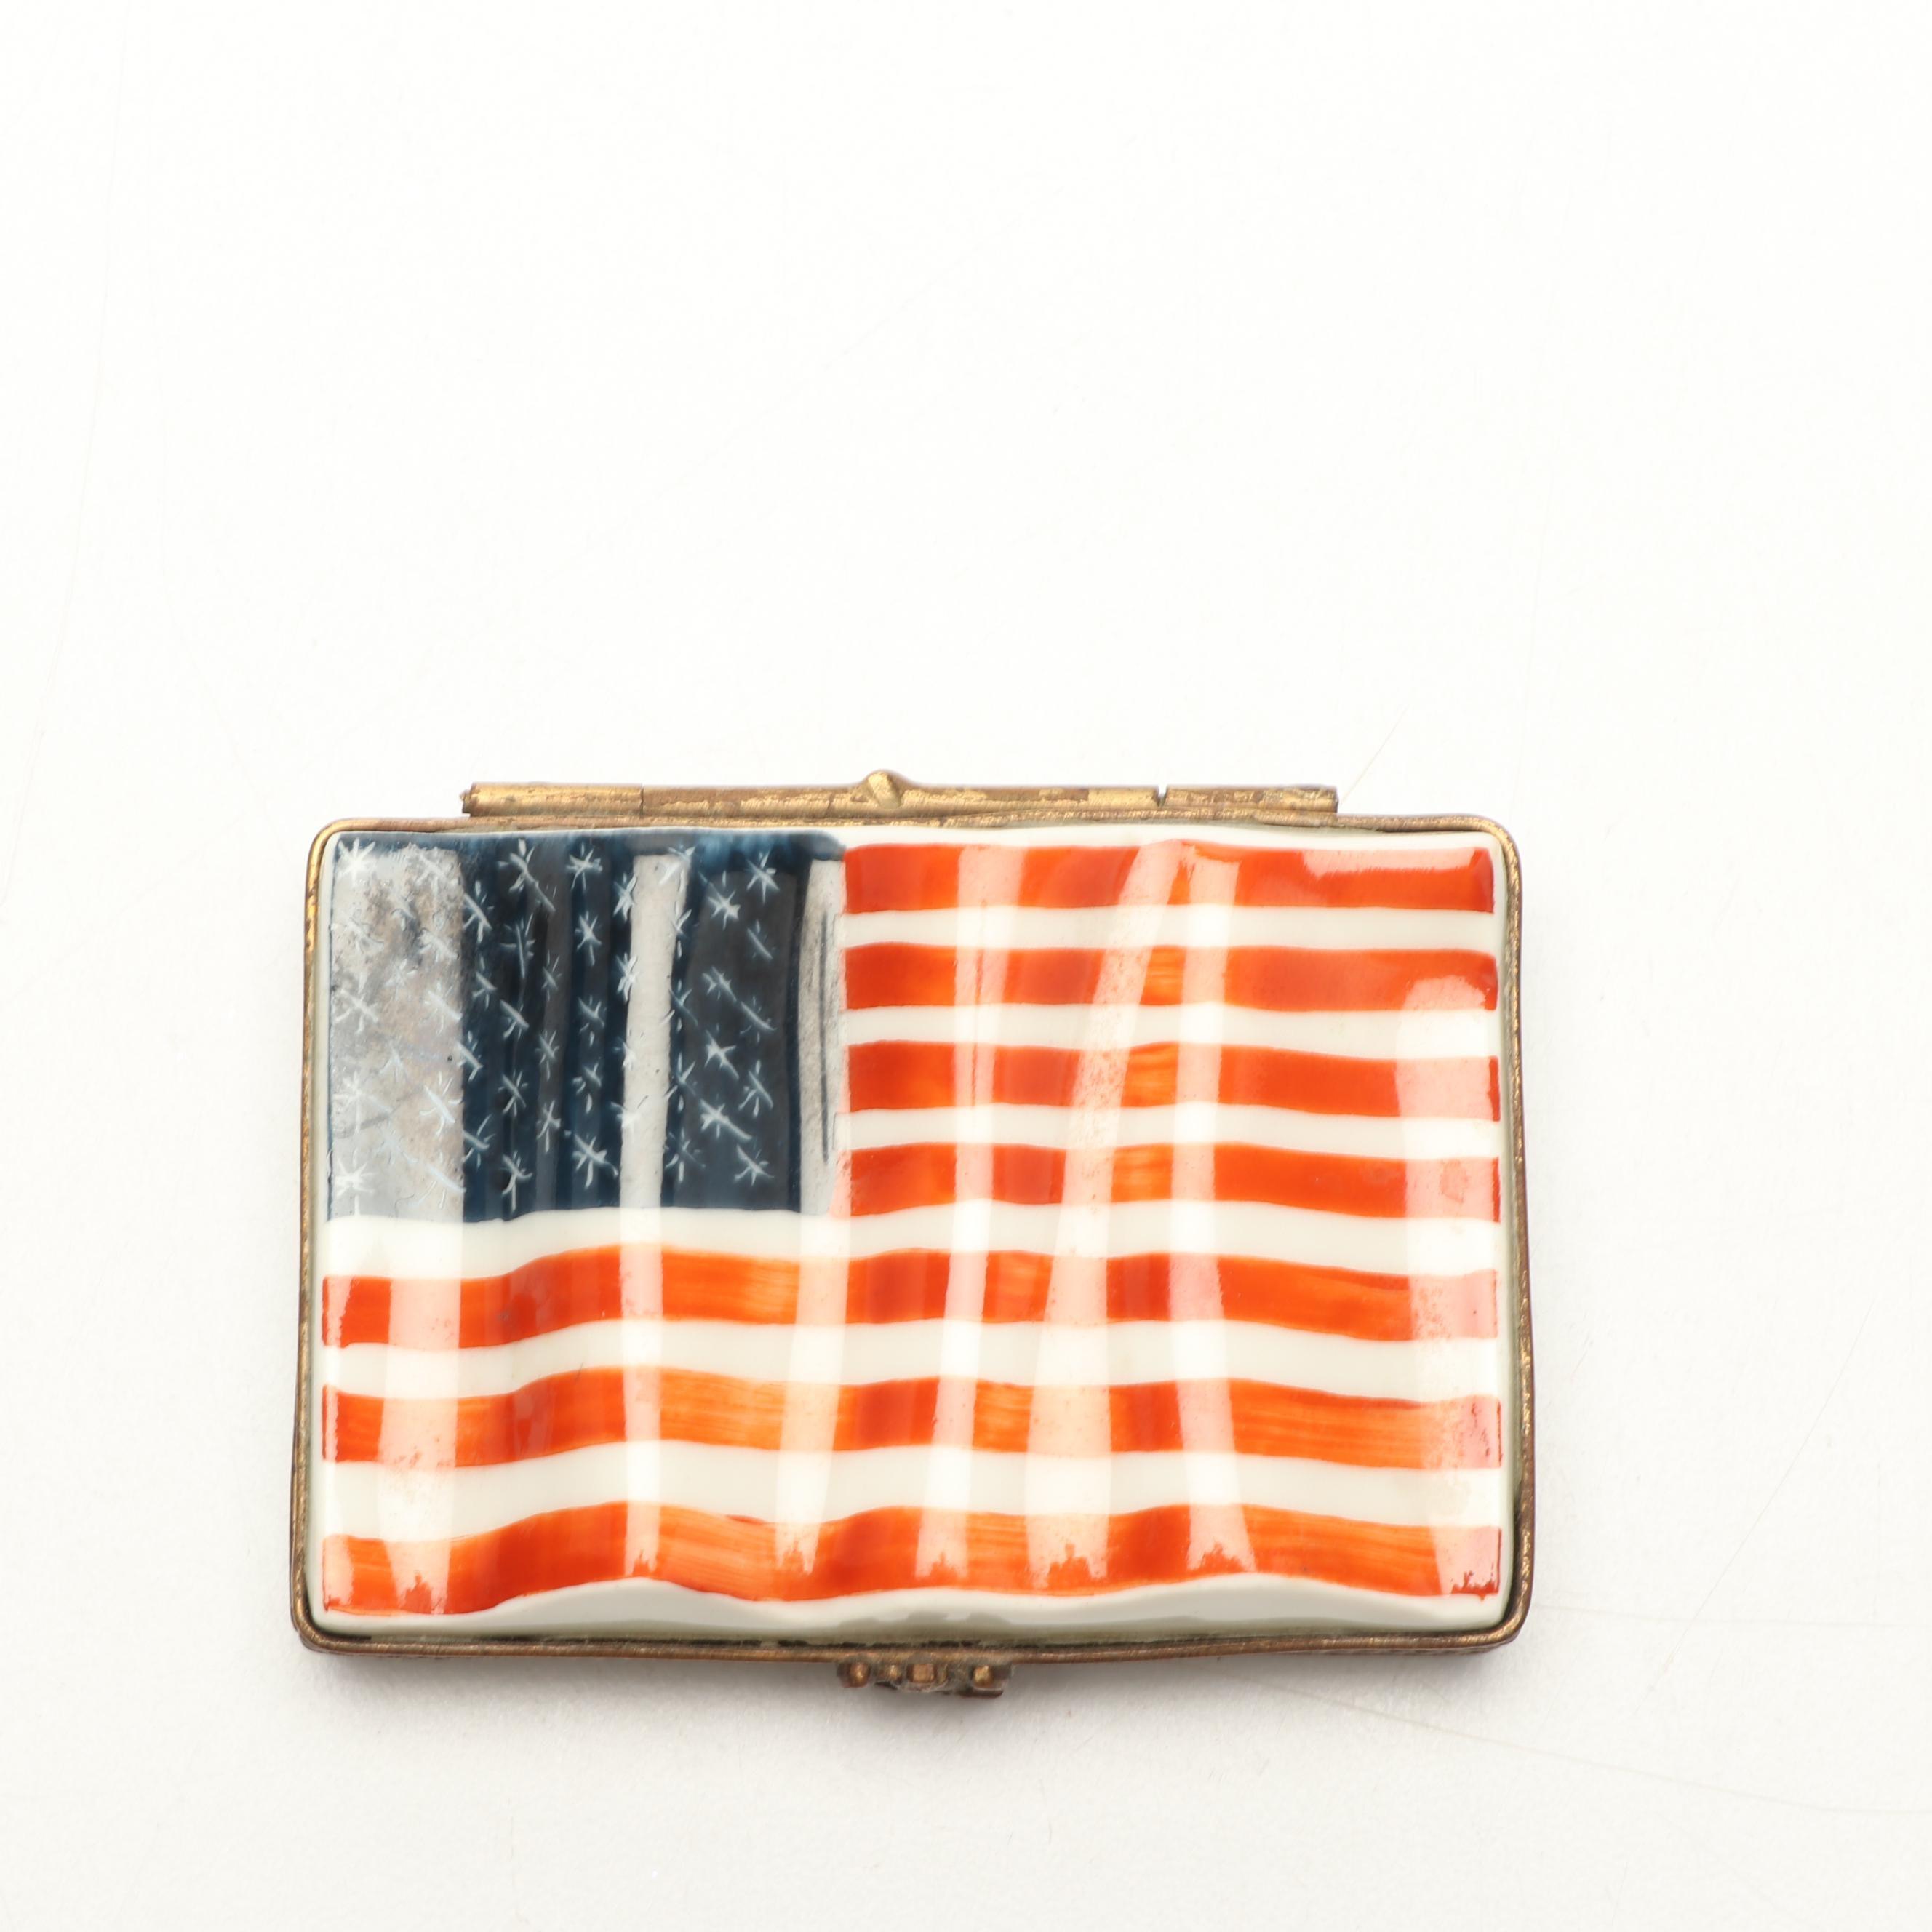 Chamart Limoges France Porcelain American Flag Trinket Box with Eagle Clasp